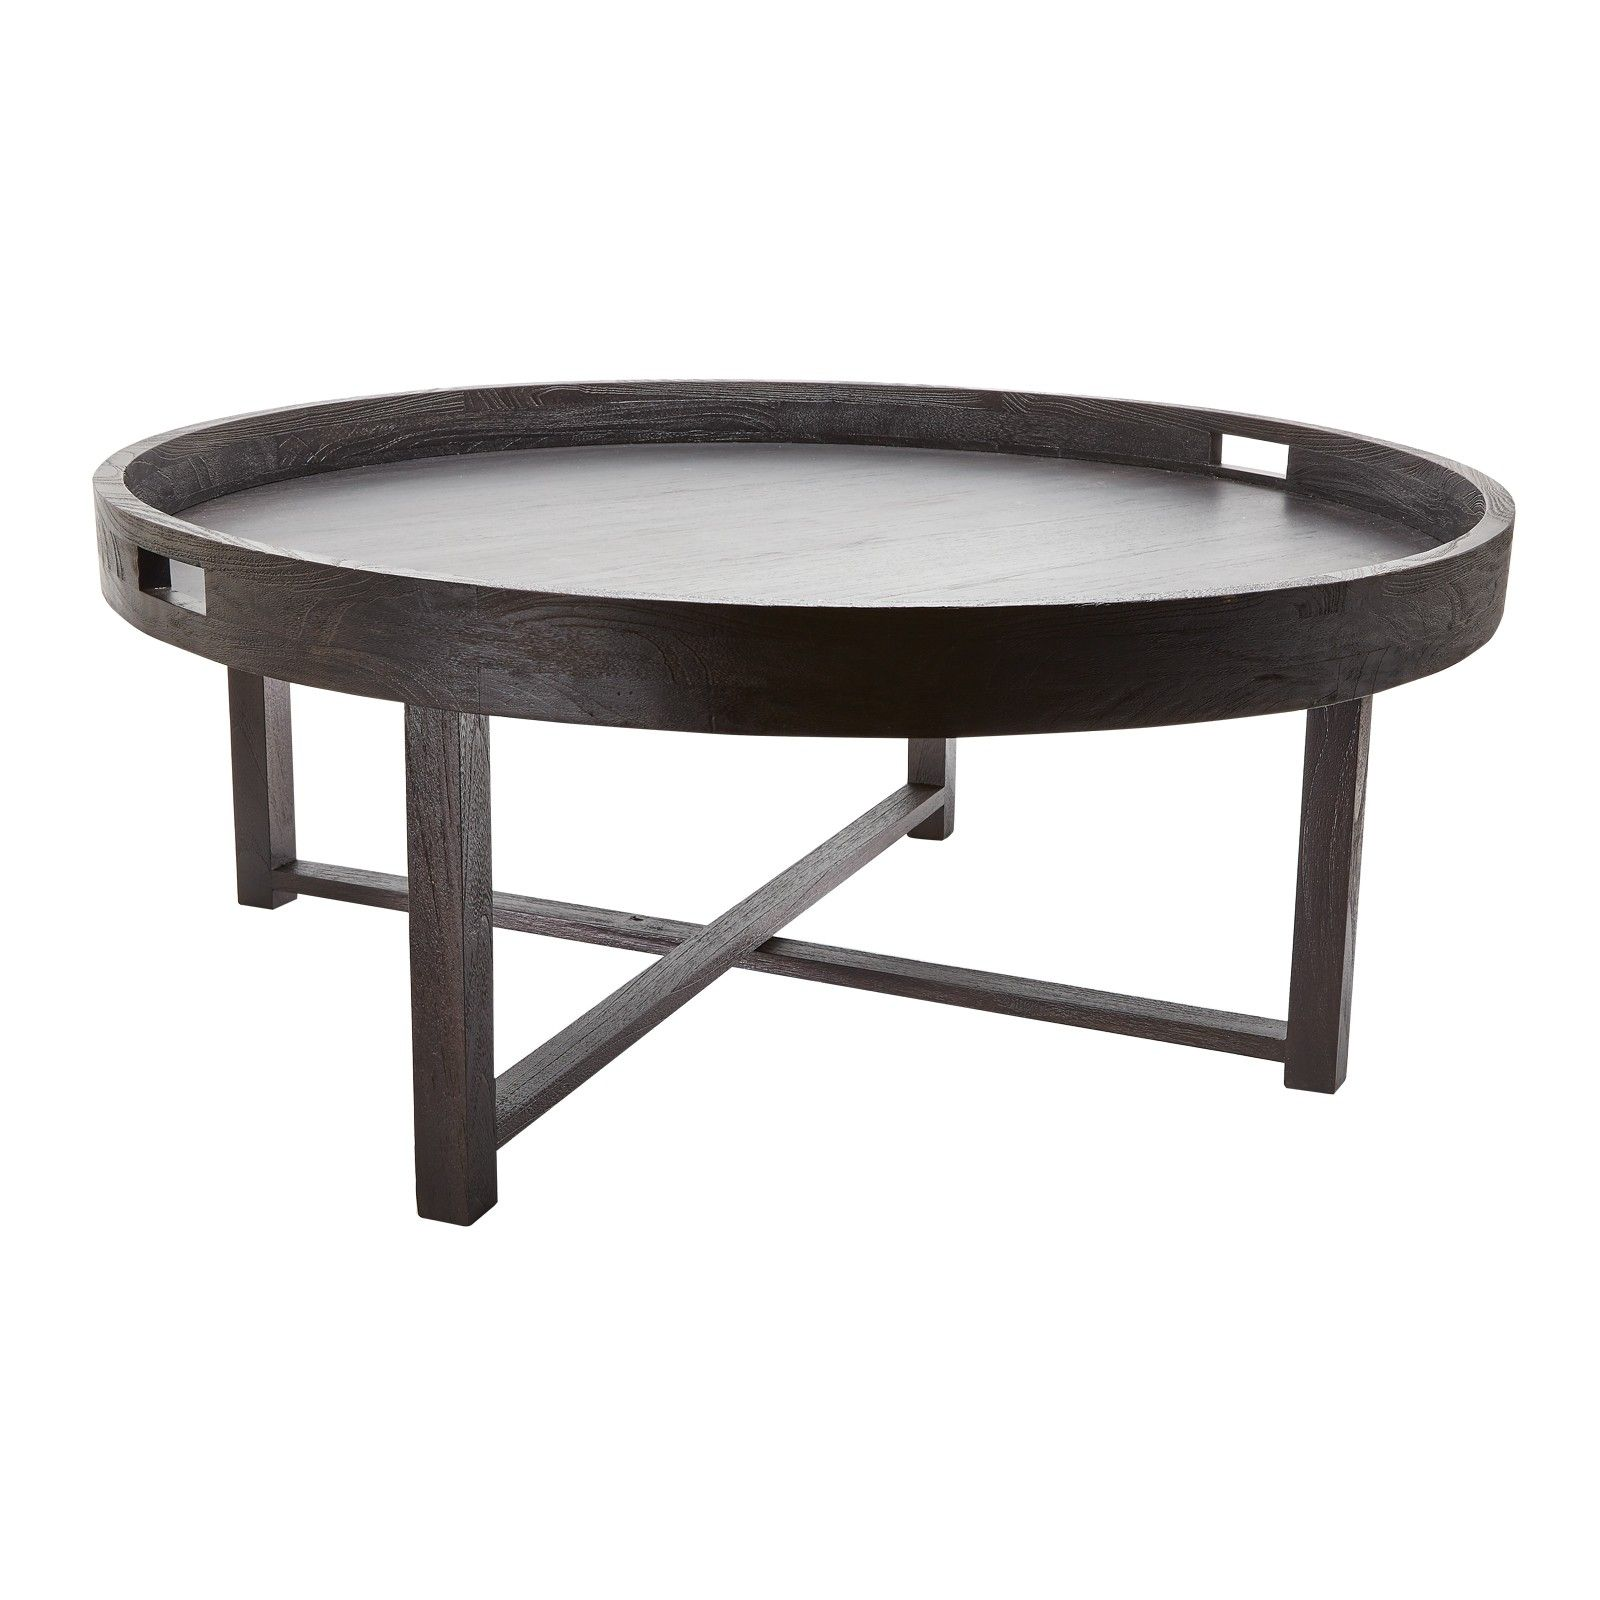 ROUND BLACK TEAK COFFEE TABLE TRAY